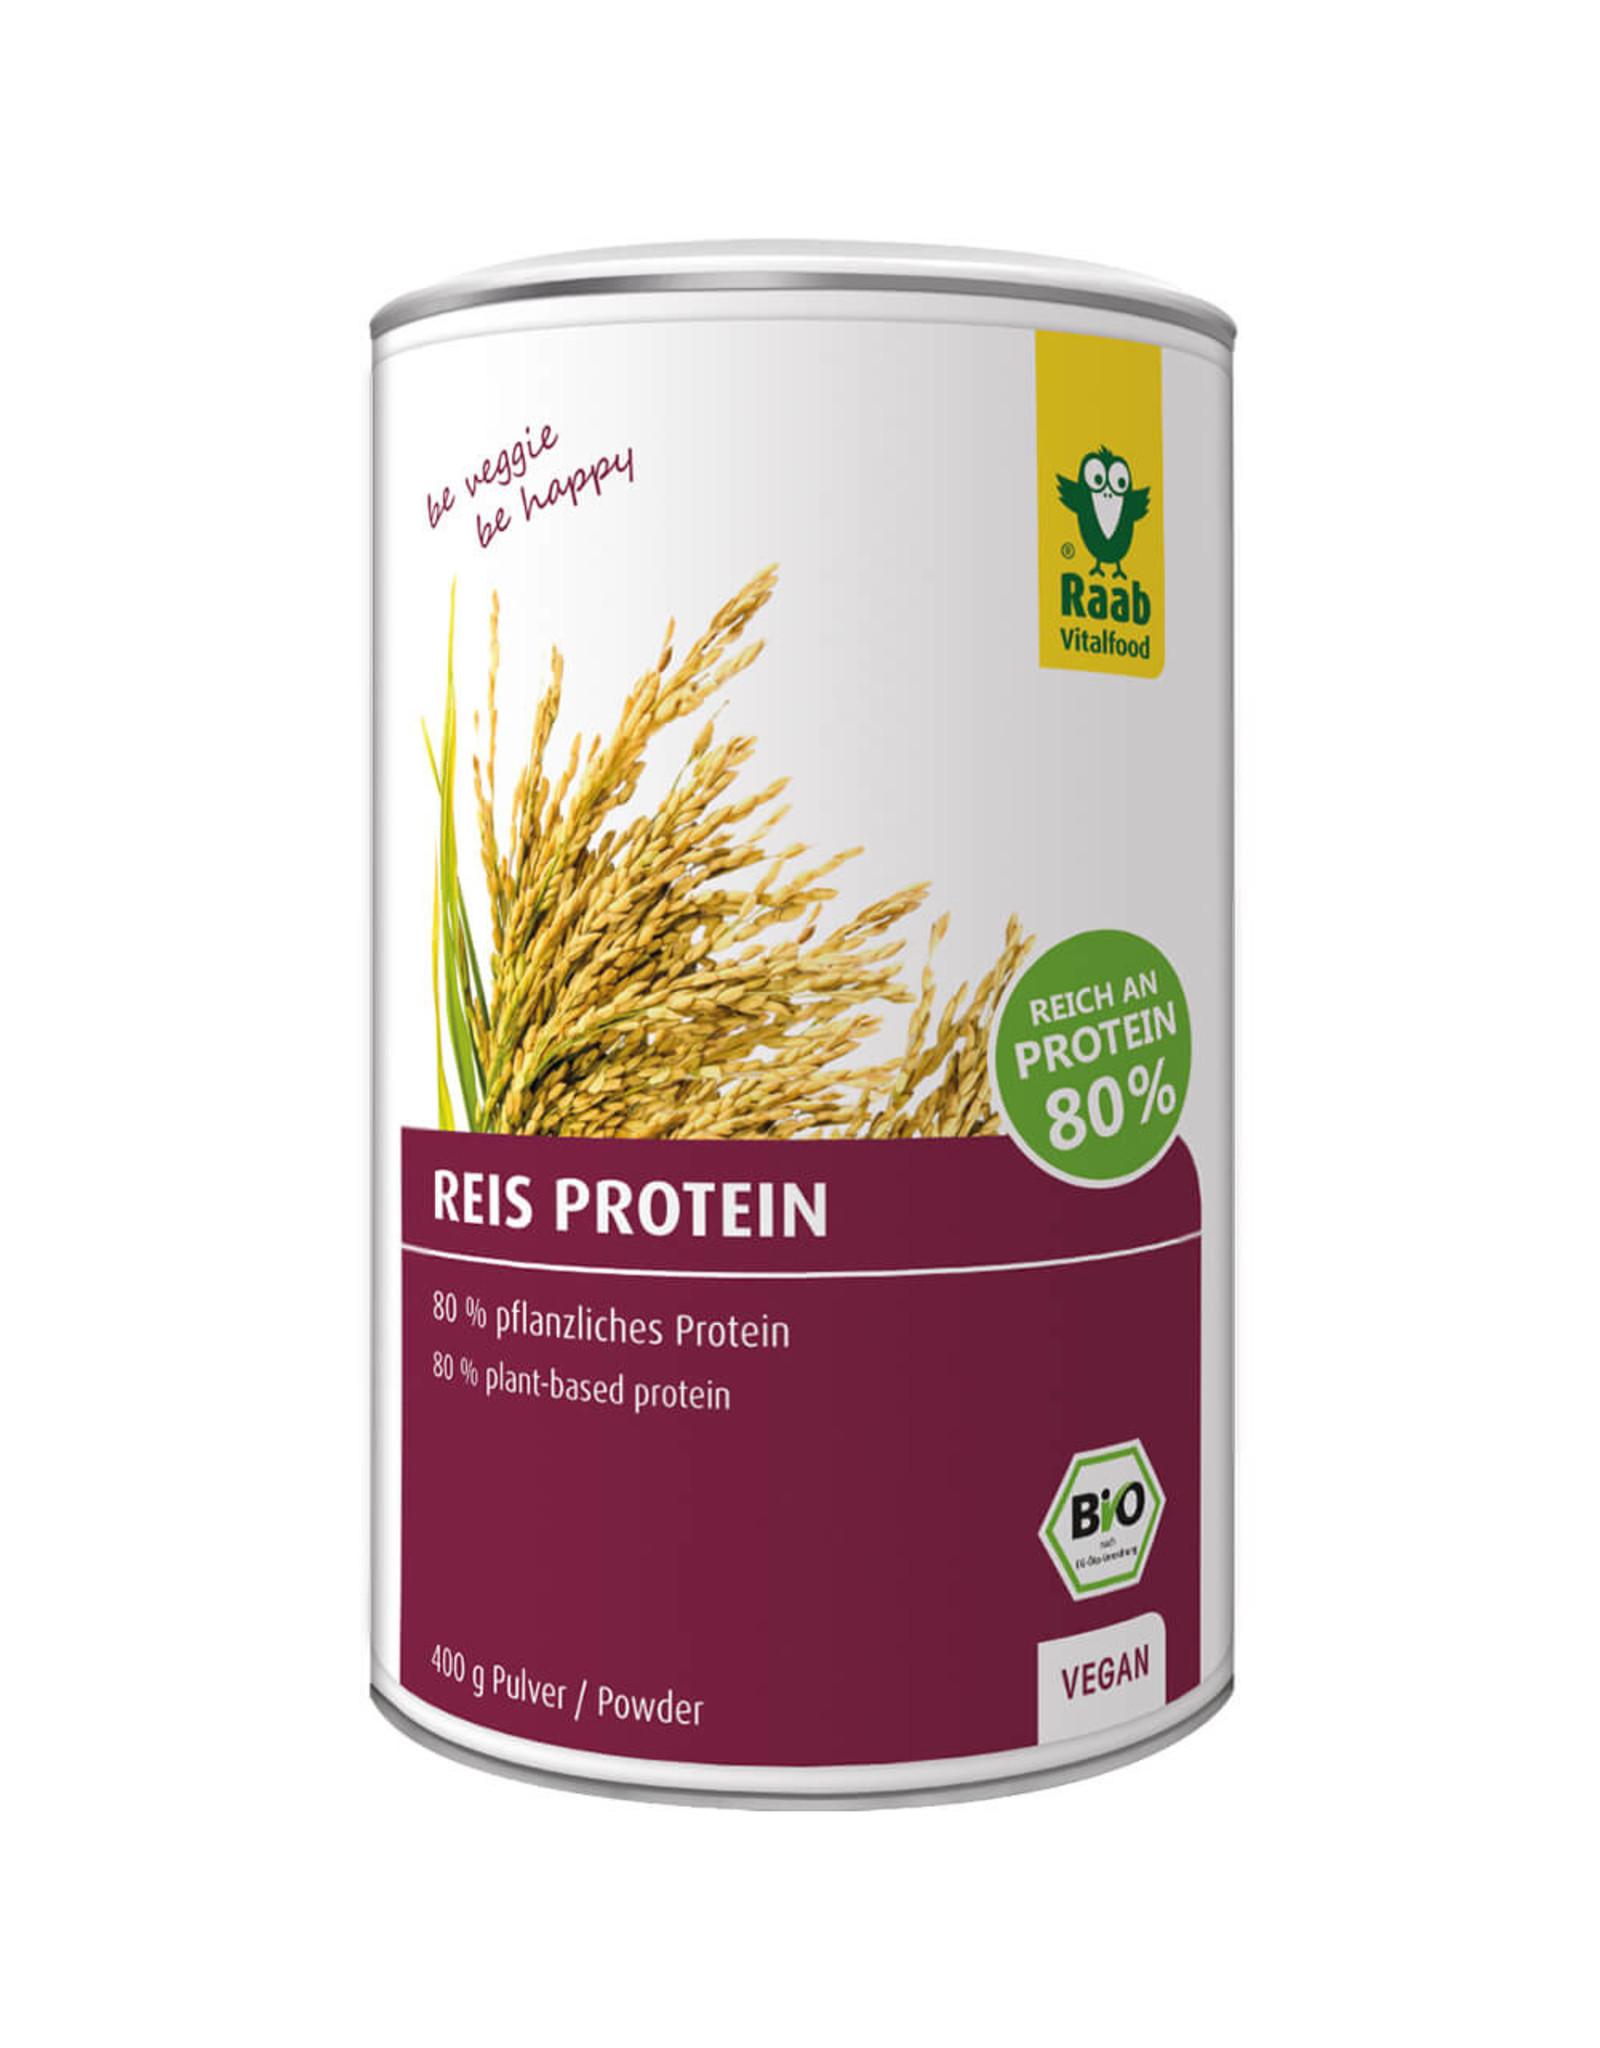 Raab Vitalfood Polvo de proteína de arroz 400g